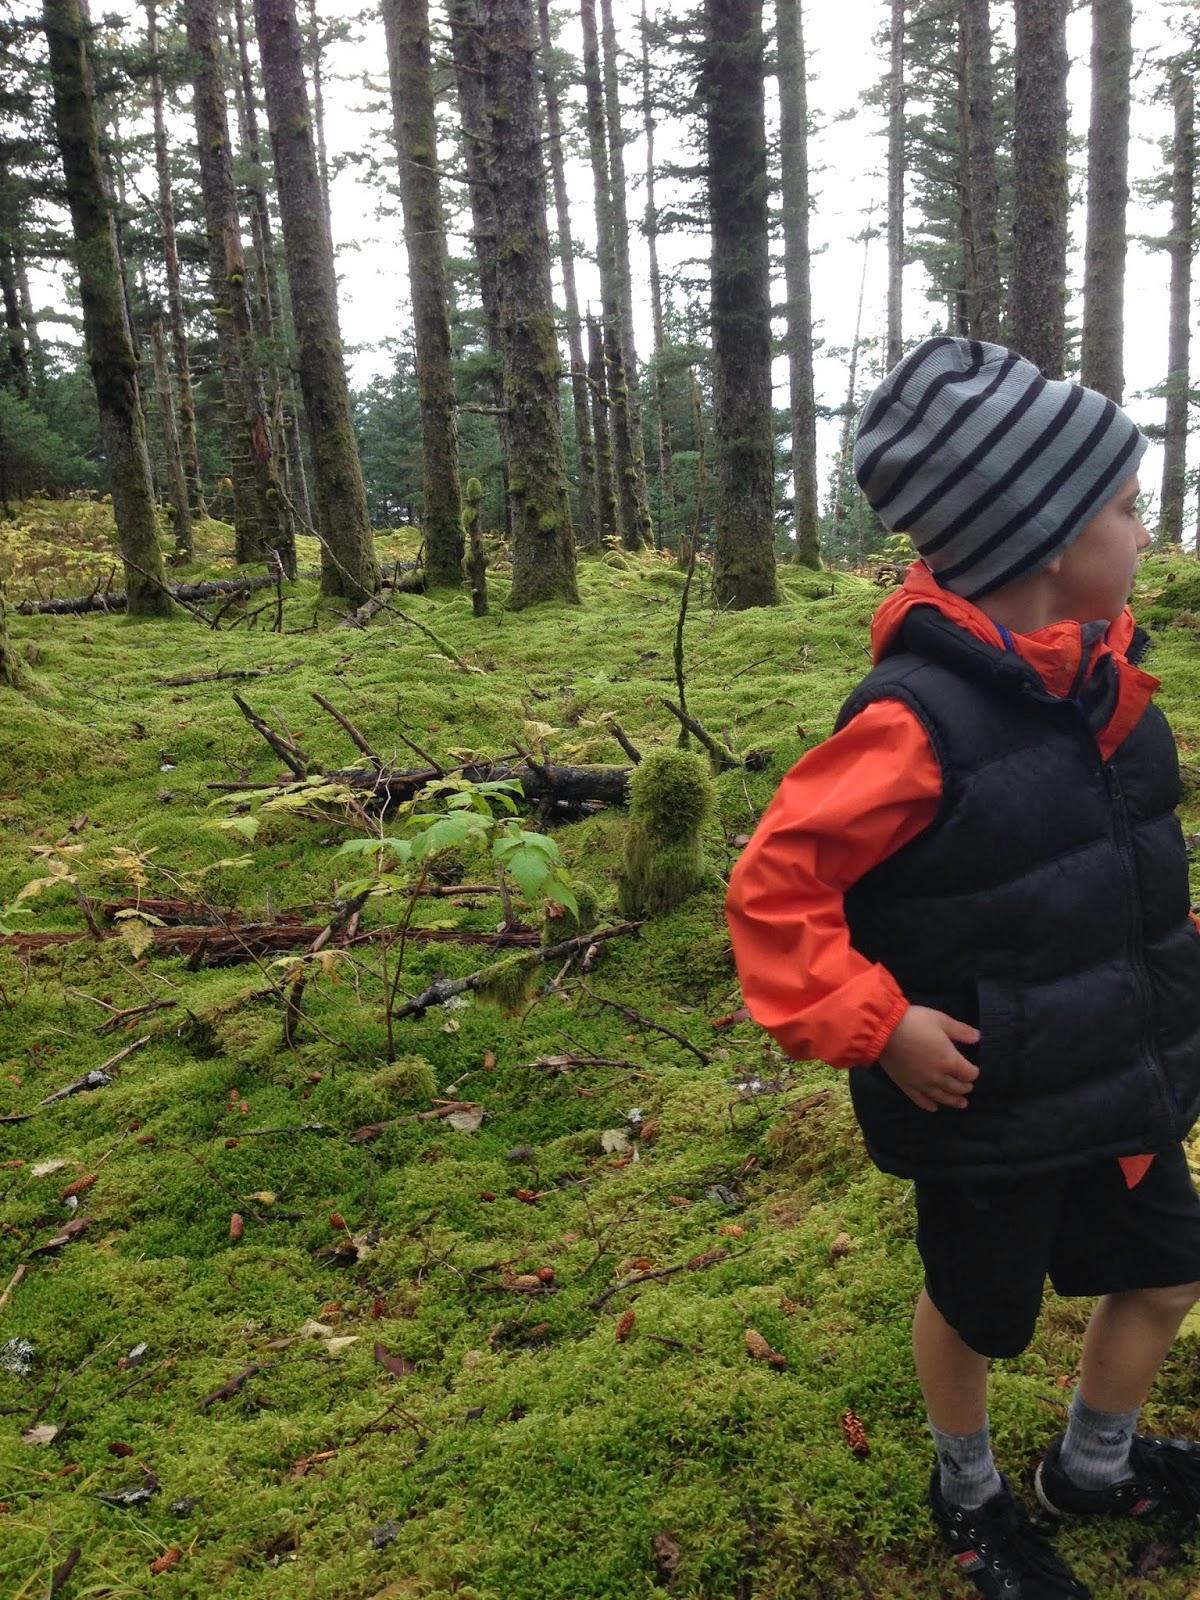 Branch Habitat Nature Walk And Journaling